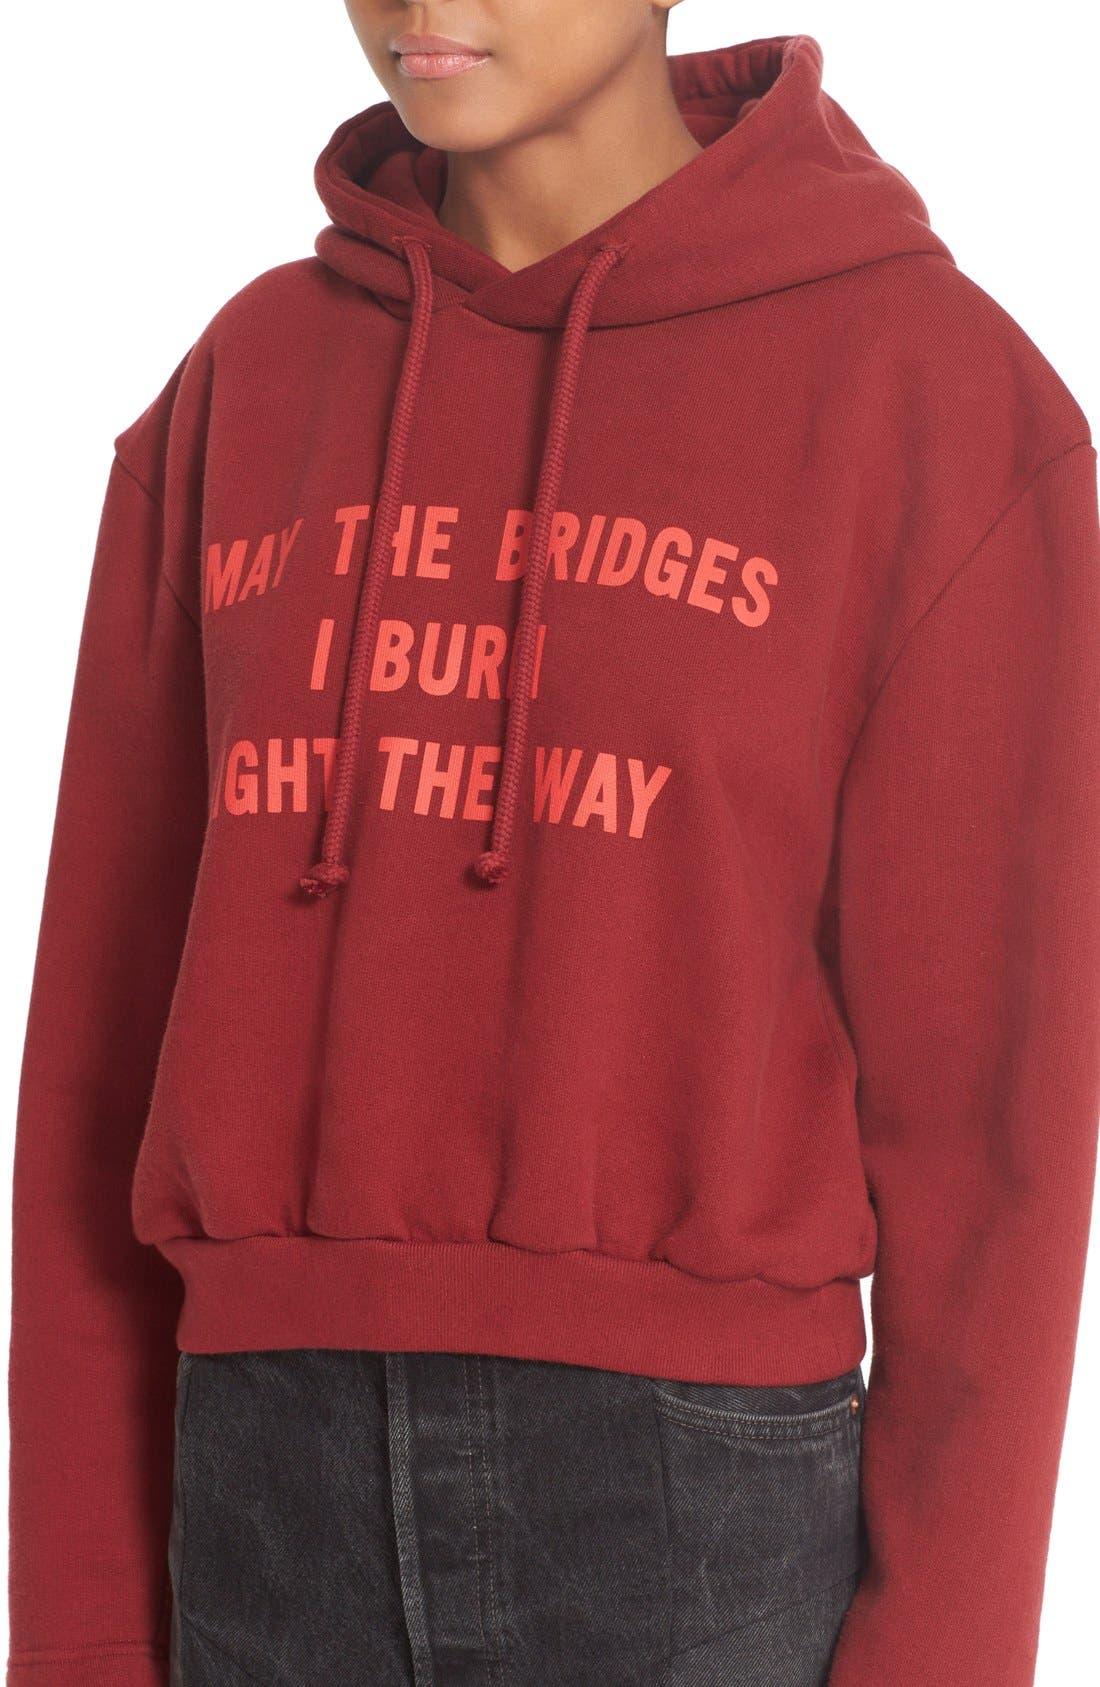 VETEMENTS,                             May the Bridges I Burn Light the Way Football Shoulder Hoodie,                             Alternate thumbnail 6, color,                             930